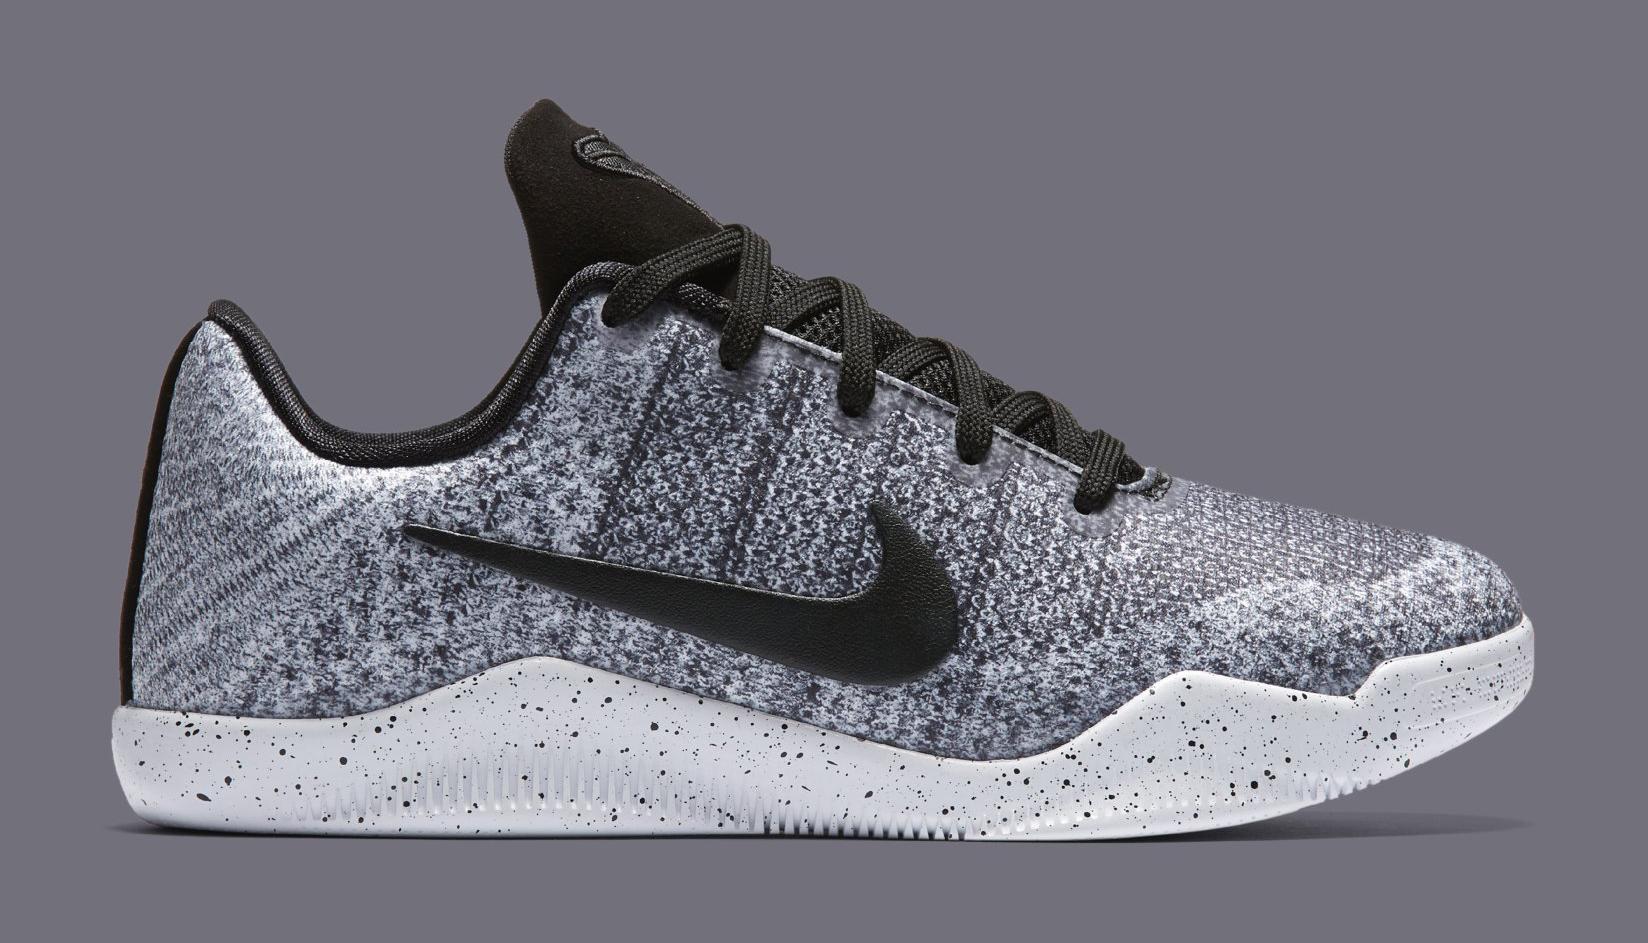 low priced ad725 11d8d ... Black Flyknit Online Nike Kobe 11 Oreo Kids 822945-100 Profile ...